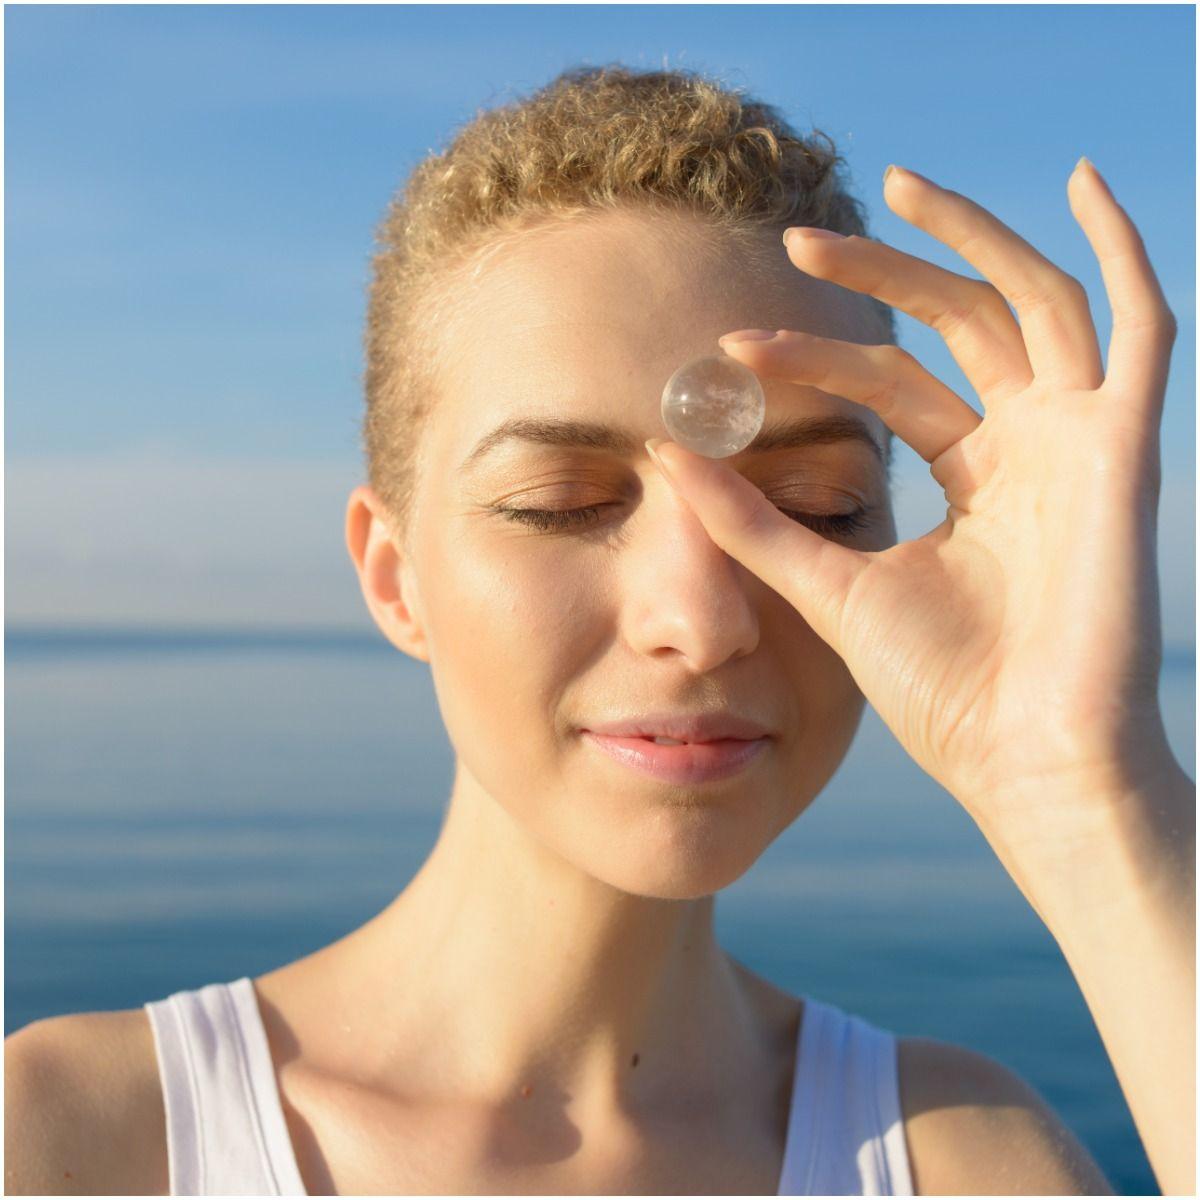 Third Eye Chakra Activation